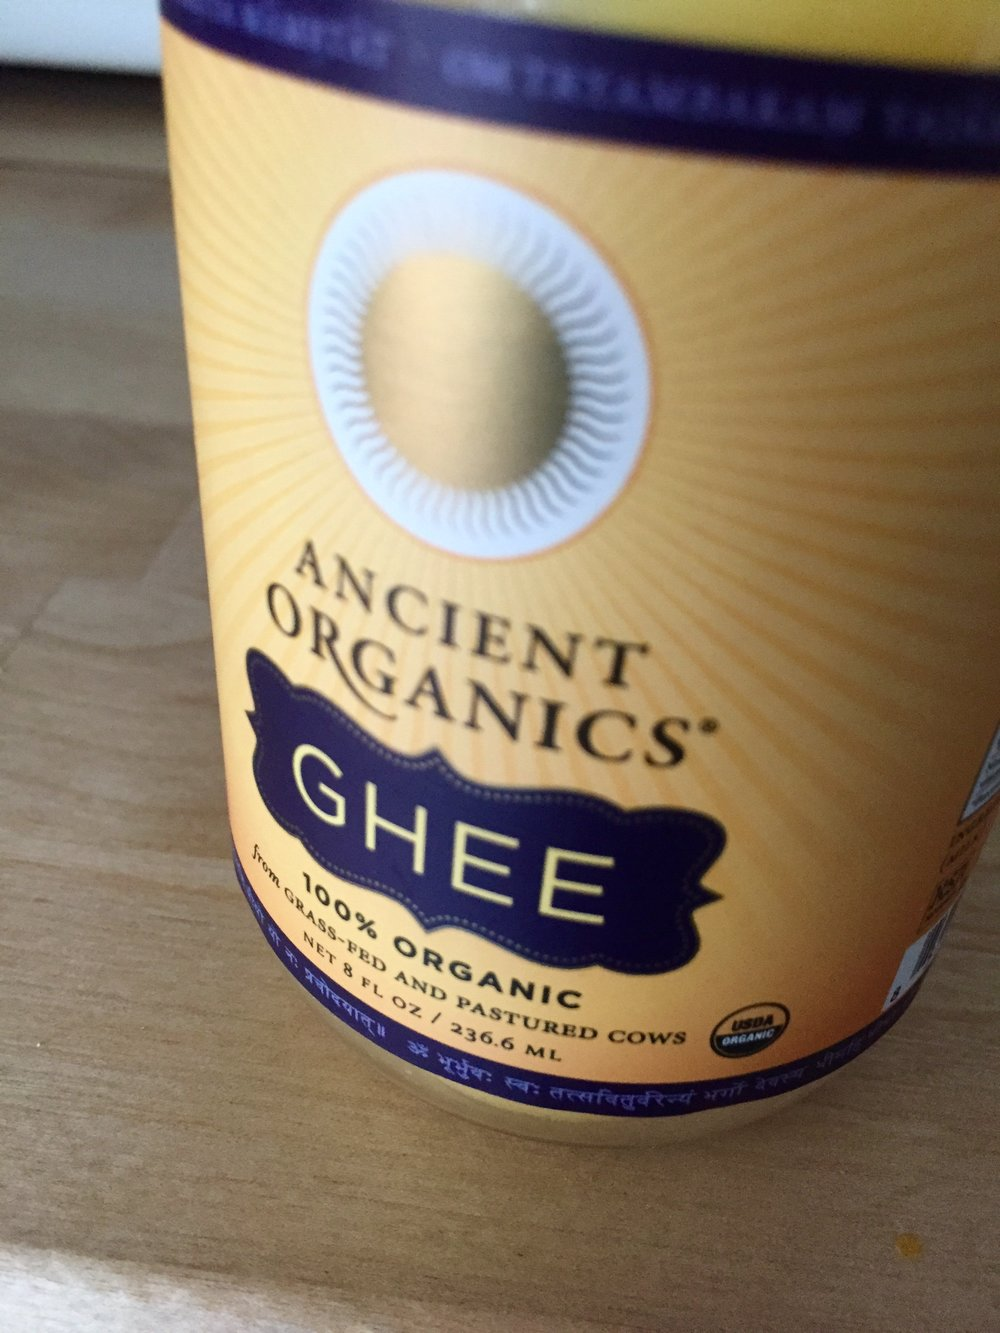 Ancient Organics Ghee, $11.95 on Amazon